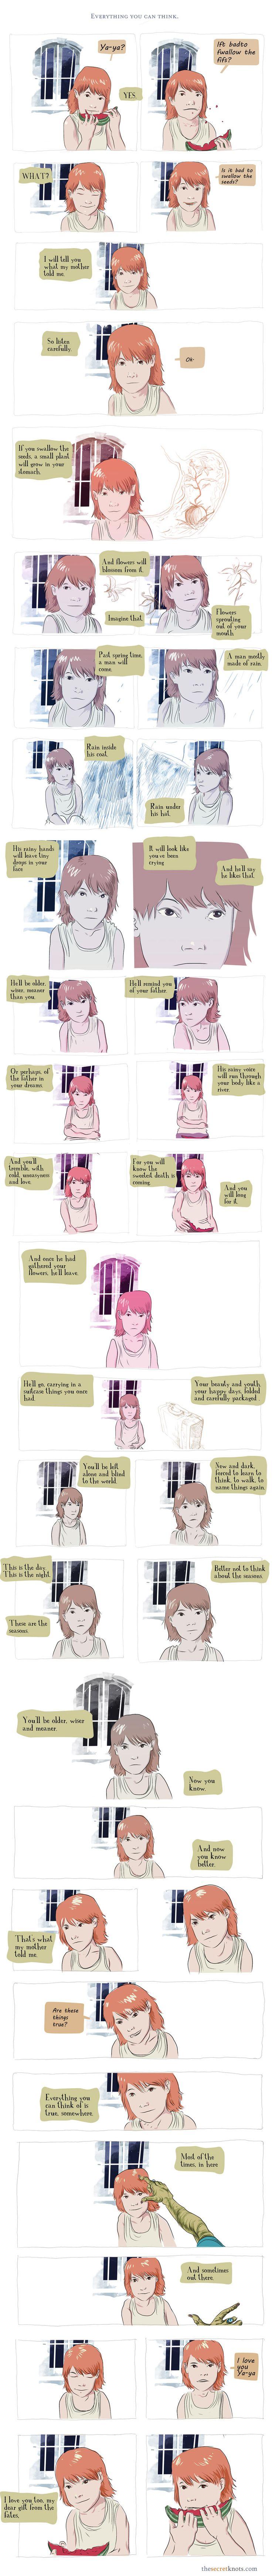 Secret Knots - #webcomic by Juan Santpau - Everything you can think - possibly my favorite secret knot so far.